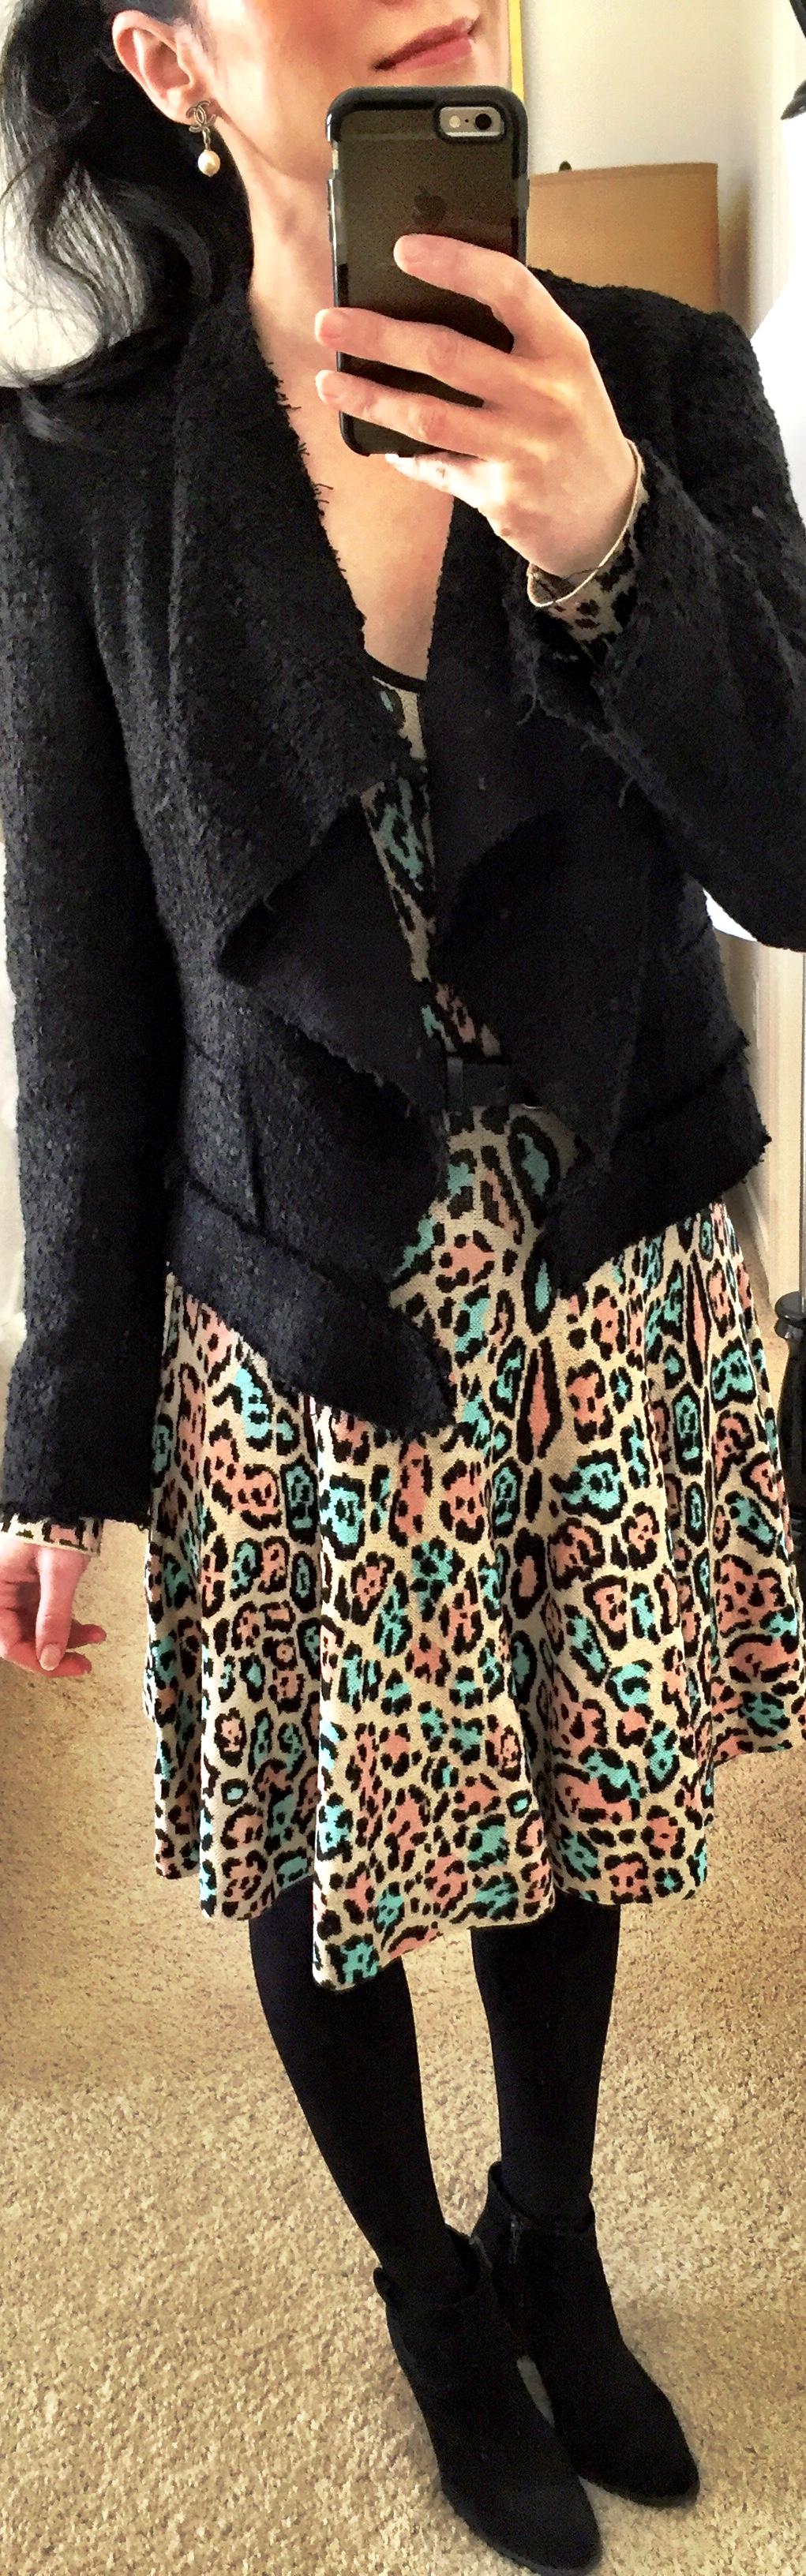 March 29th, BCBG knit dress with woven biker jacket by Zara